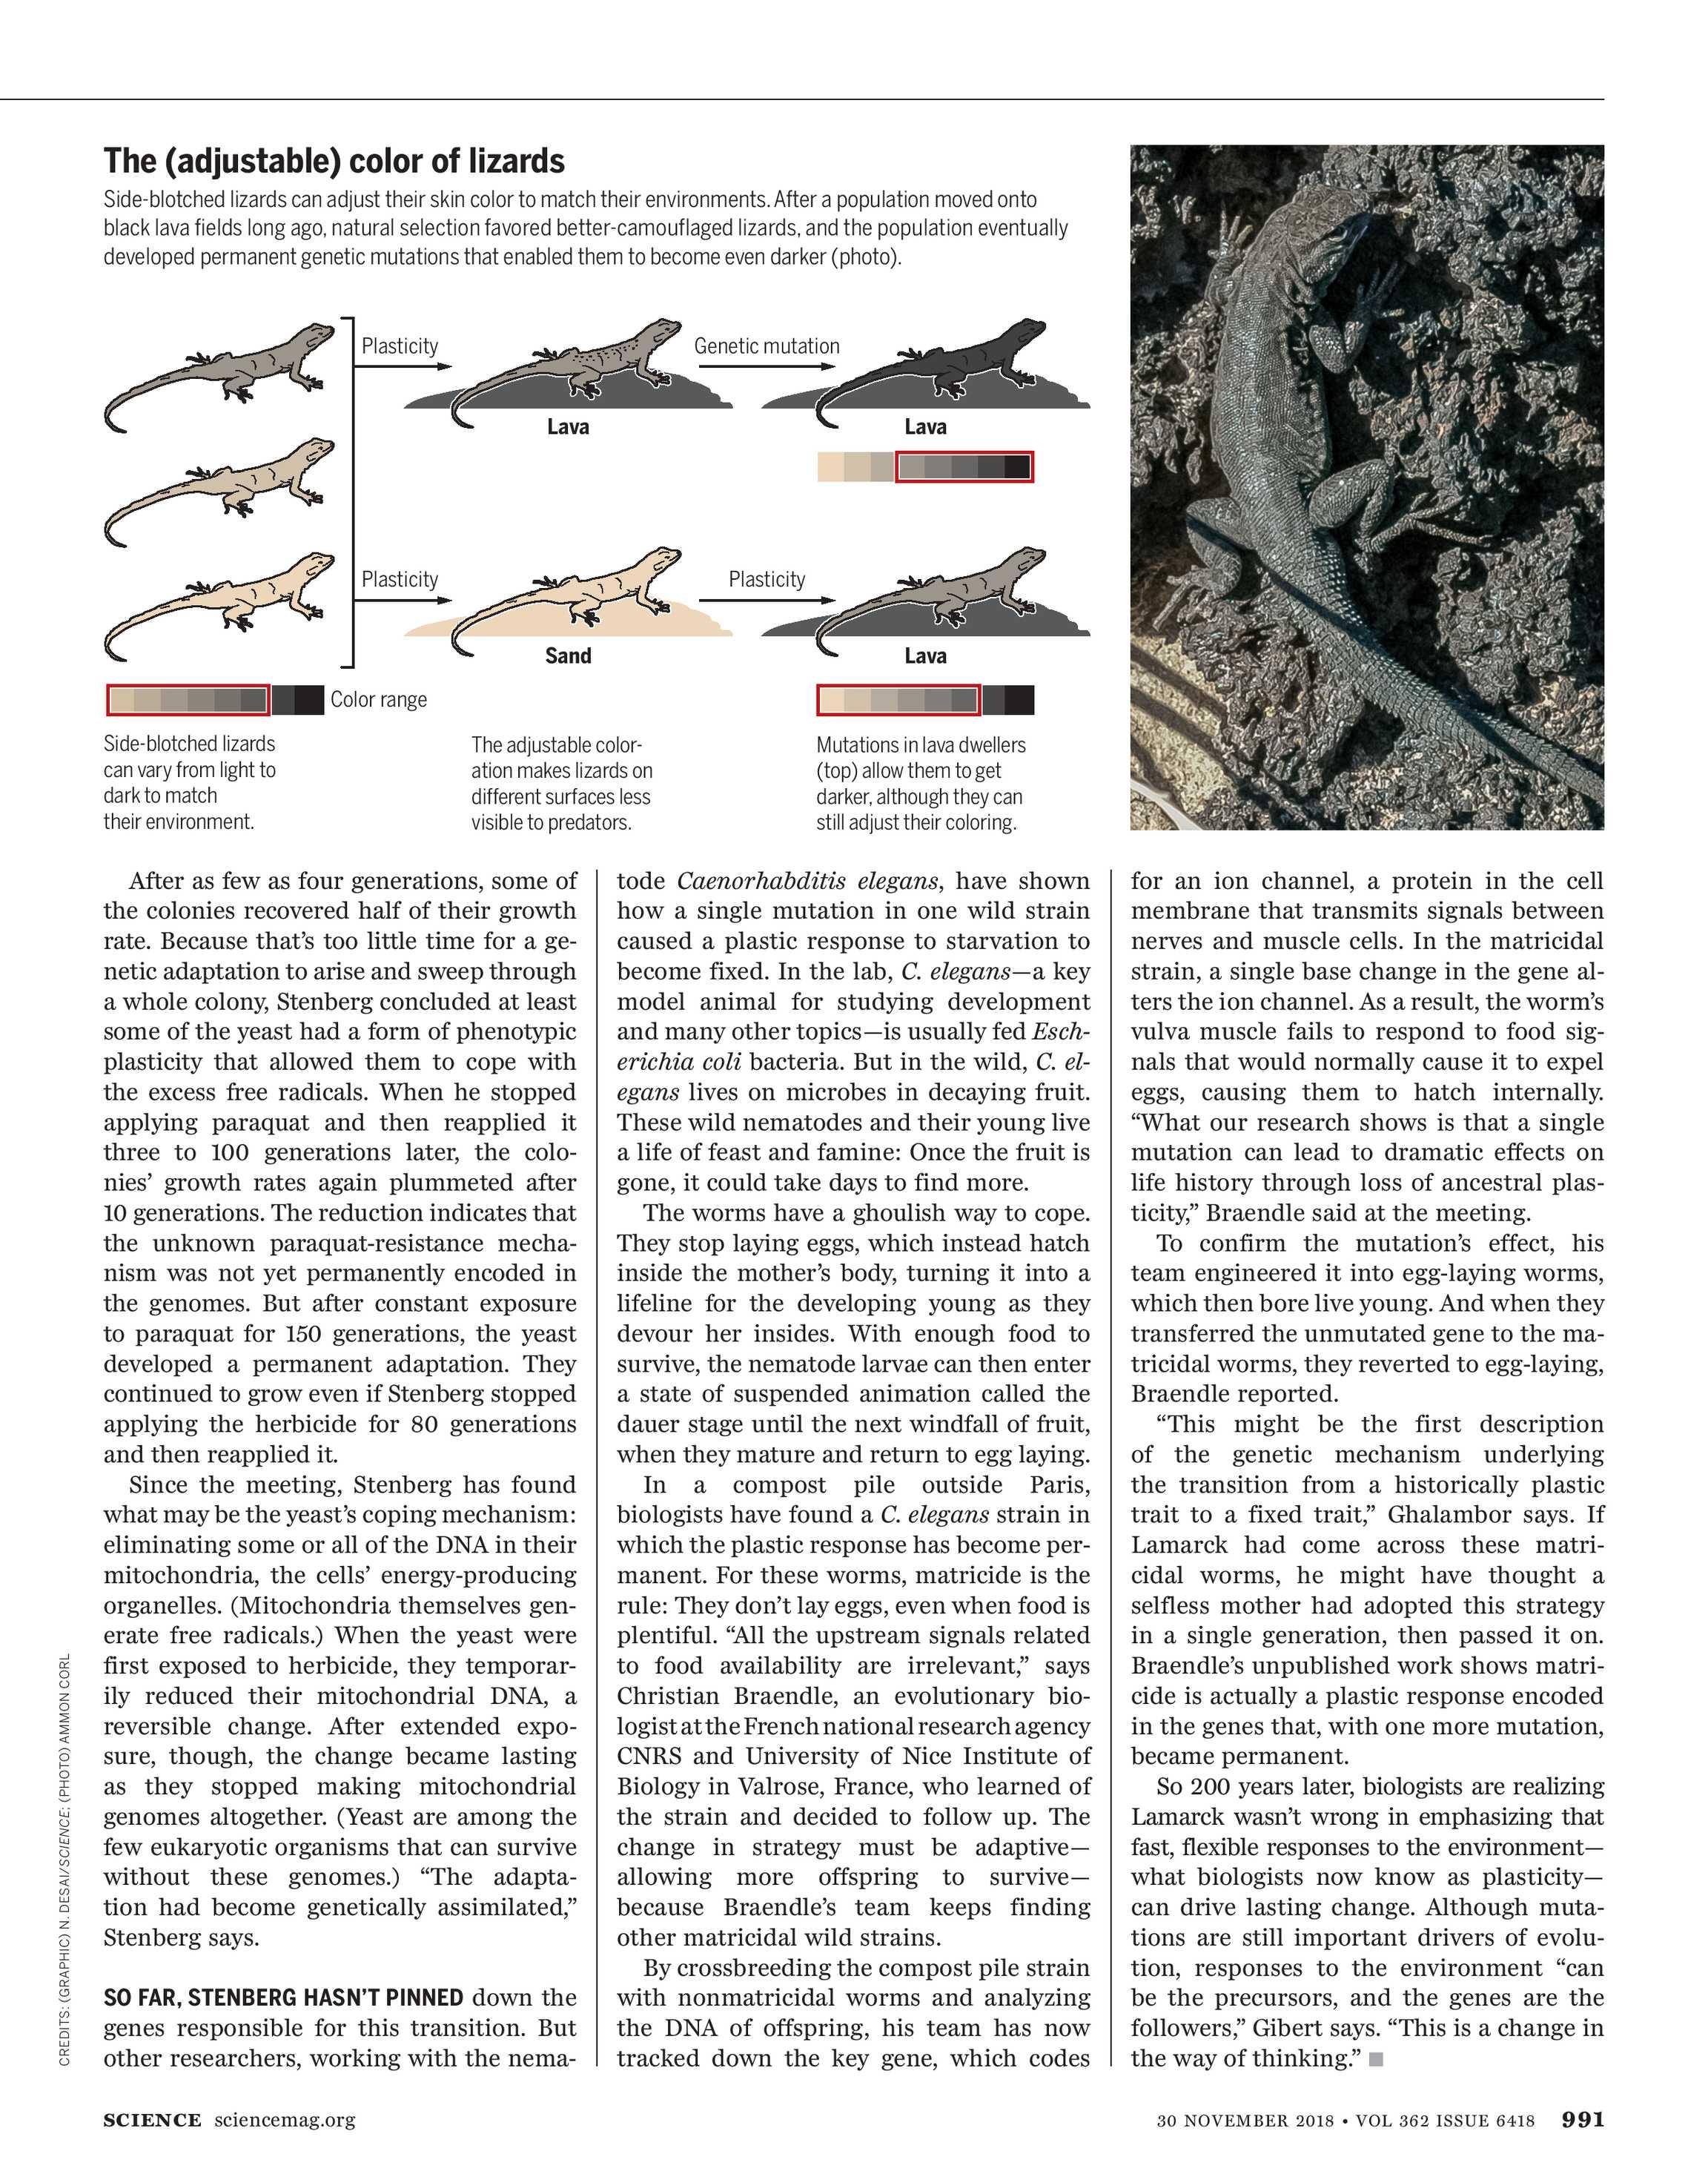 Science Magazine - November 30, 2018 - page 992